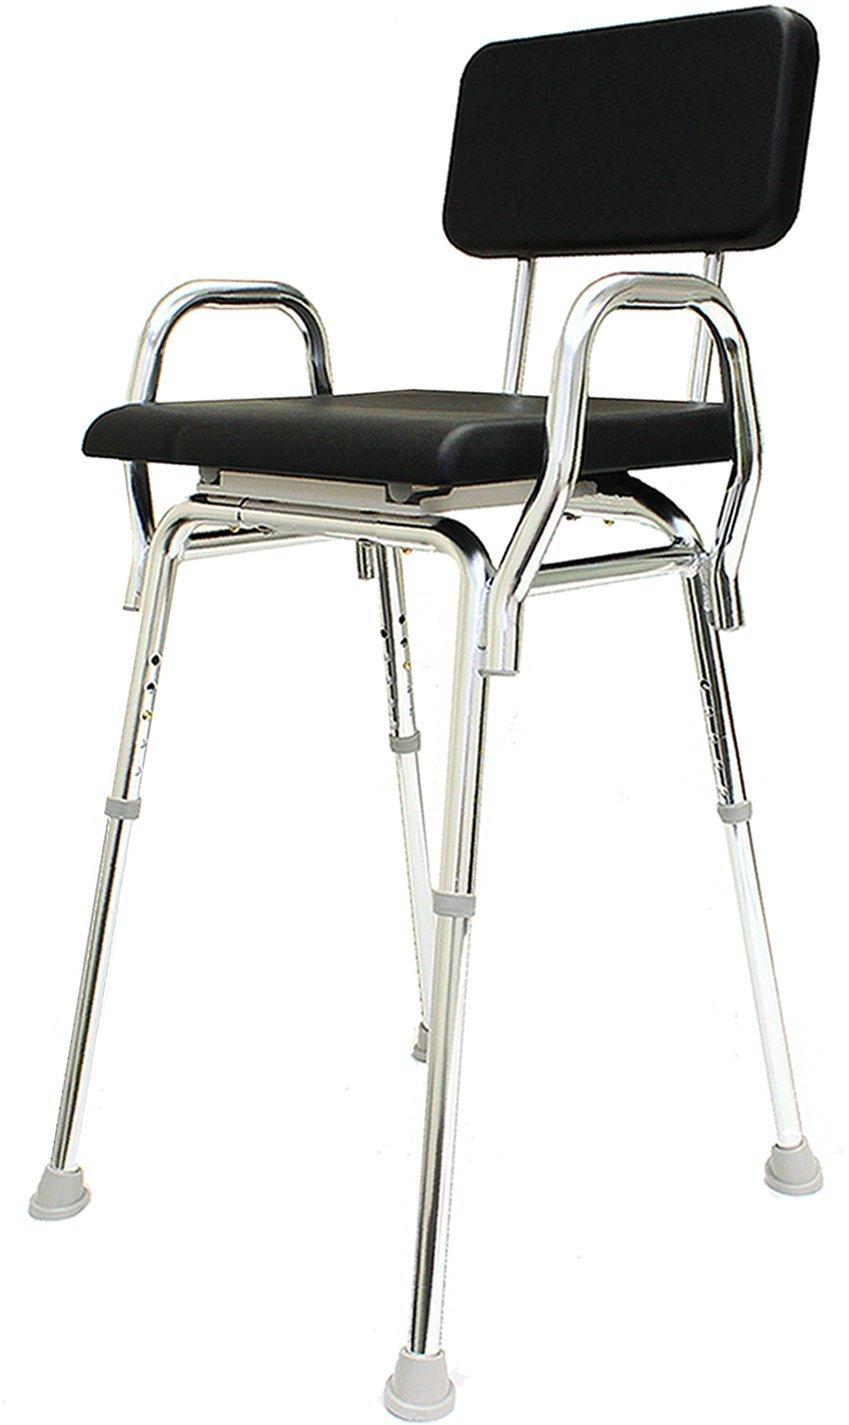 Padded Hip Shower Chair (73131) - (Seat Height: 27'' - 31'') - Bath Seat Chair - Eagle Health Supplies